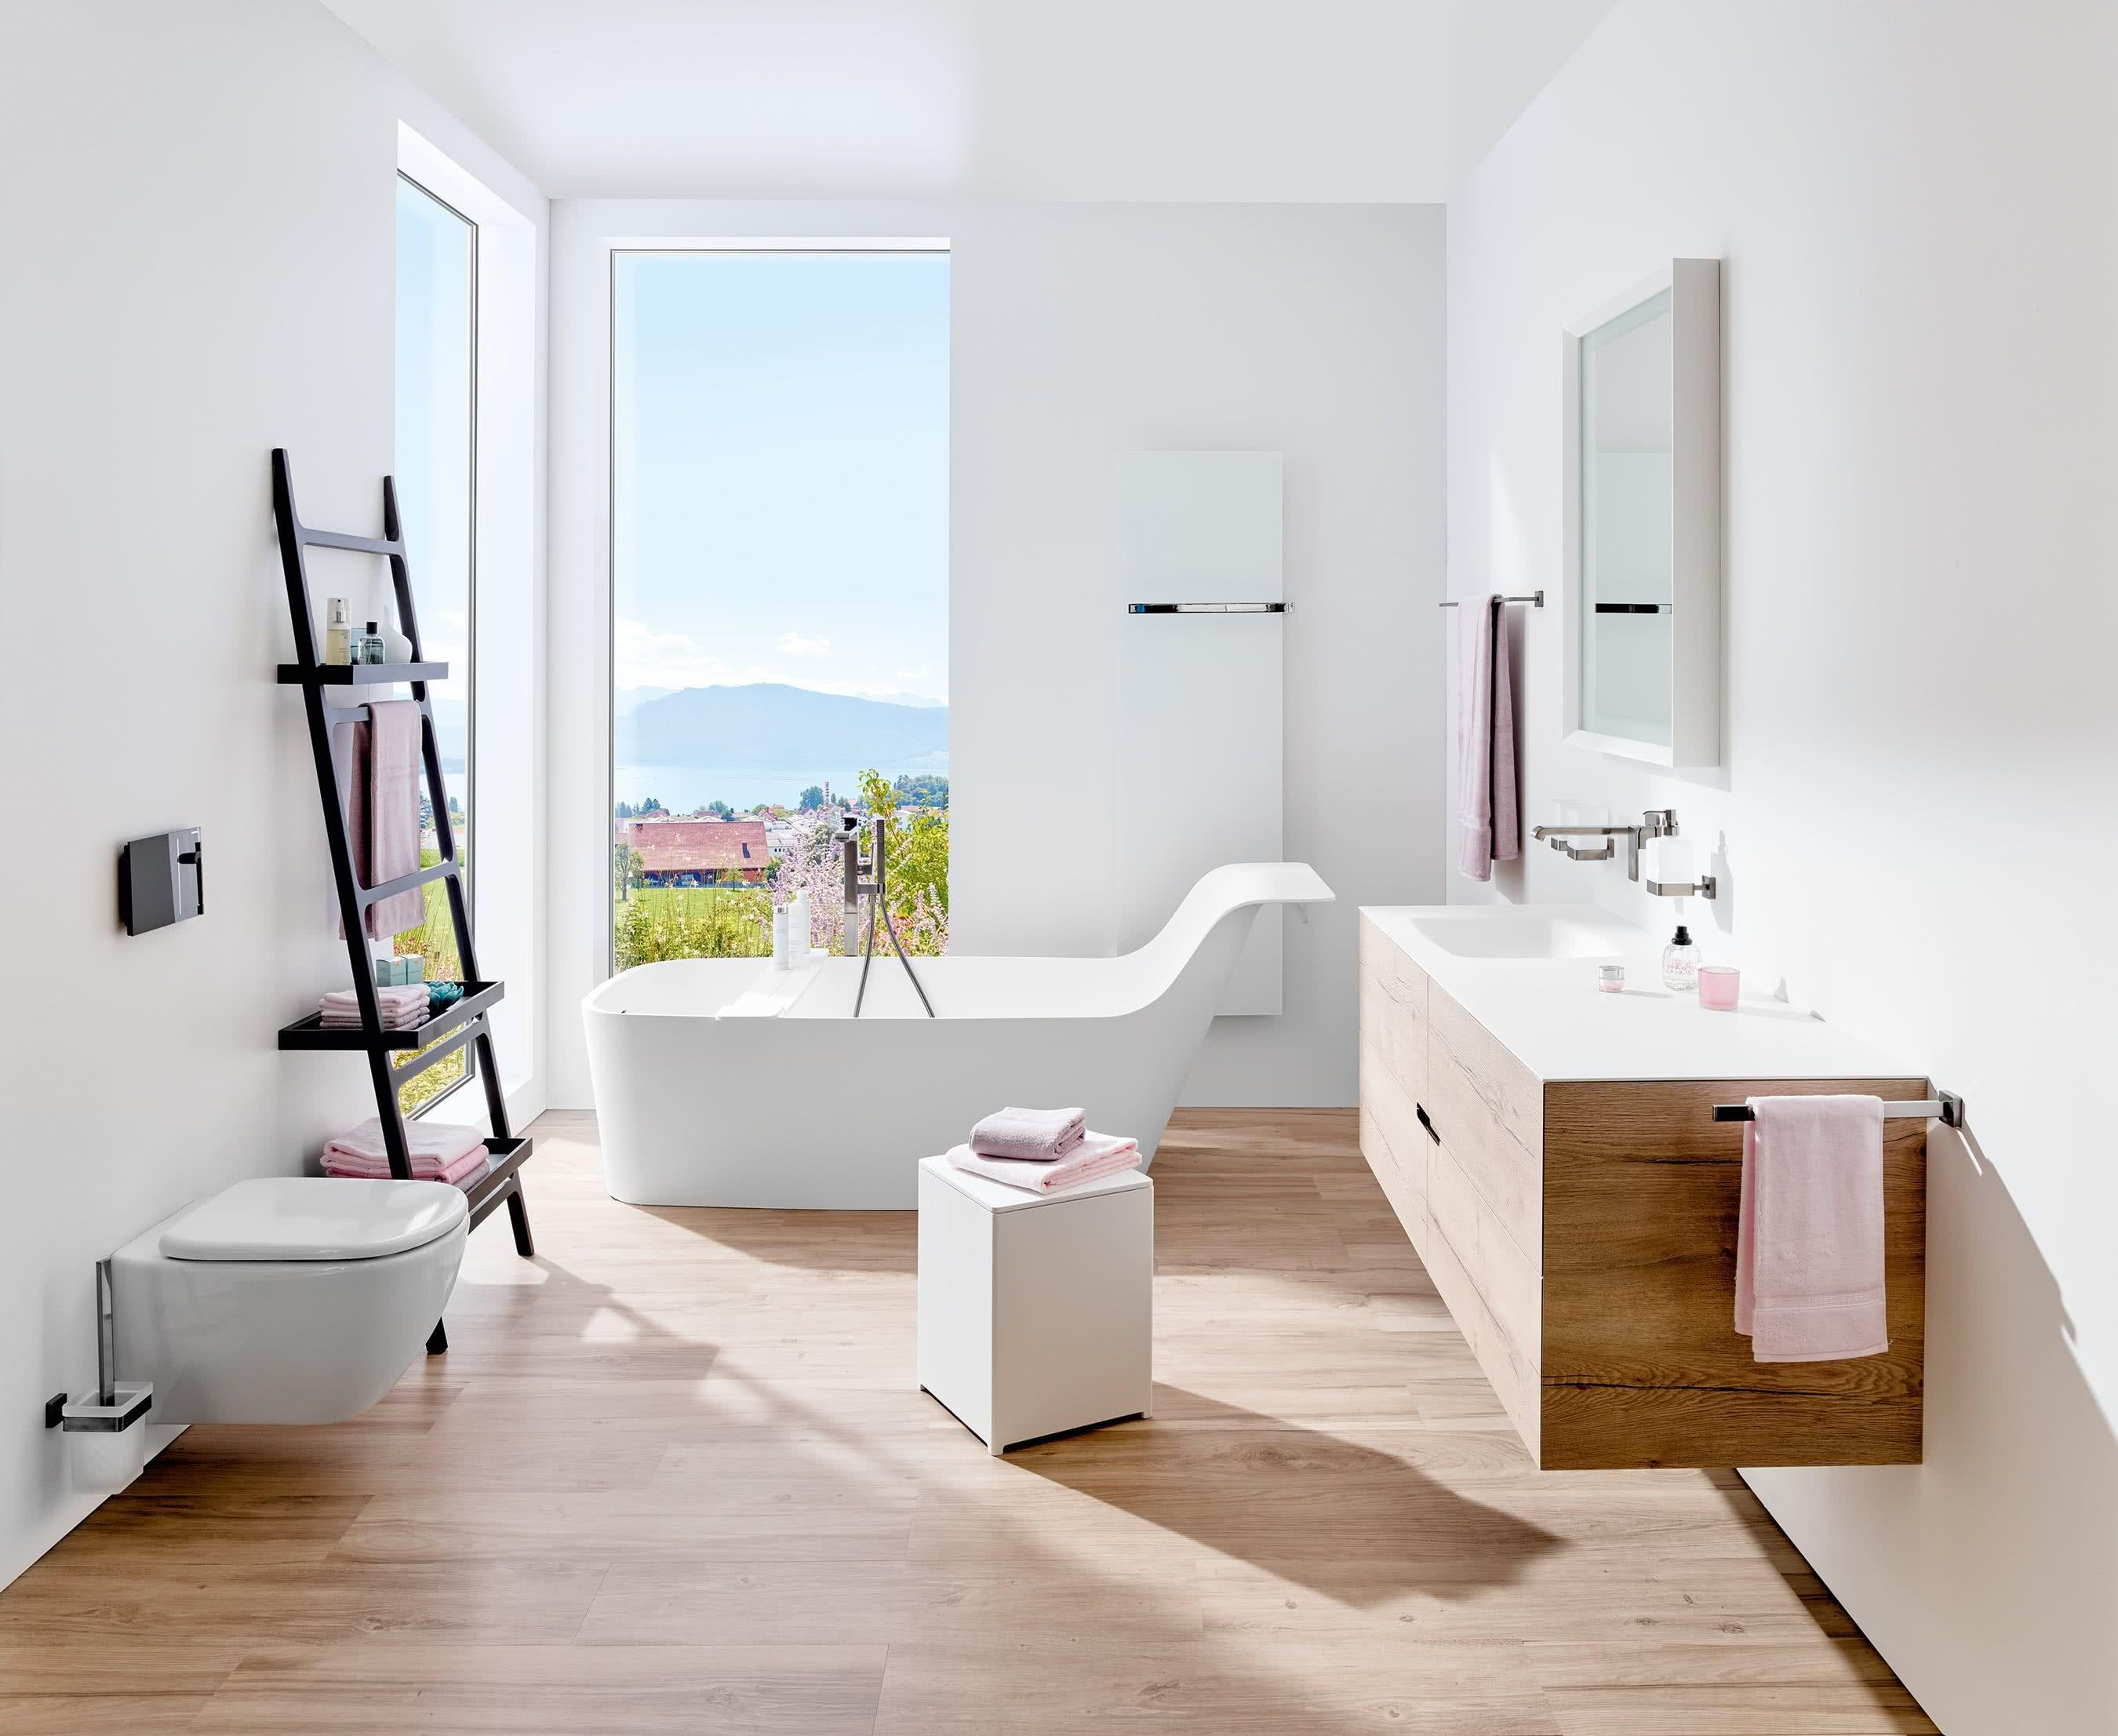 Badezimmer planen   Badumbau   Badezimmer renovieren